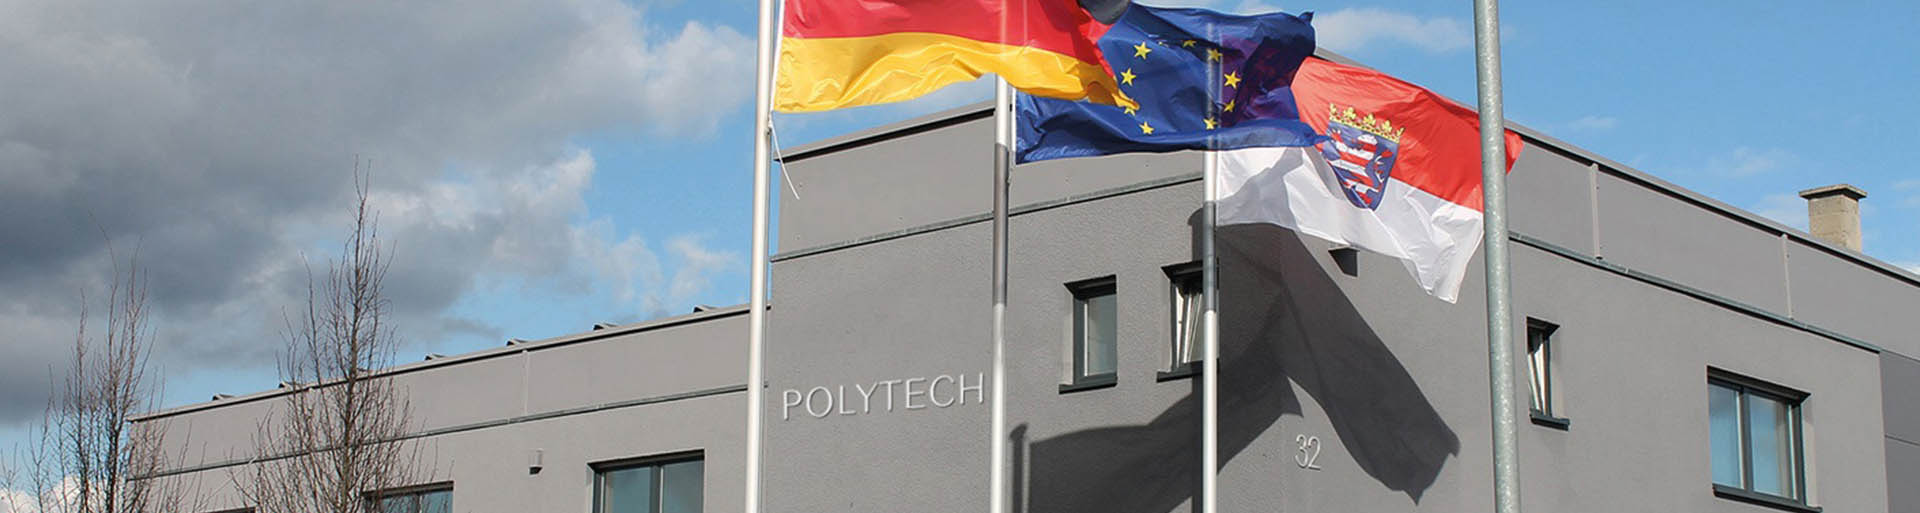 POLYTECH Health & Aesthetics - Breast Implants